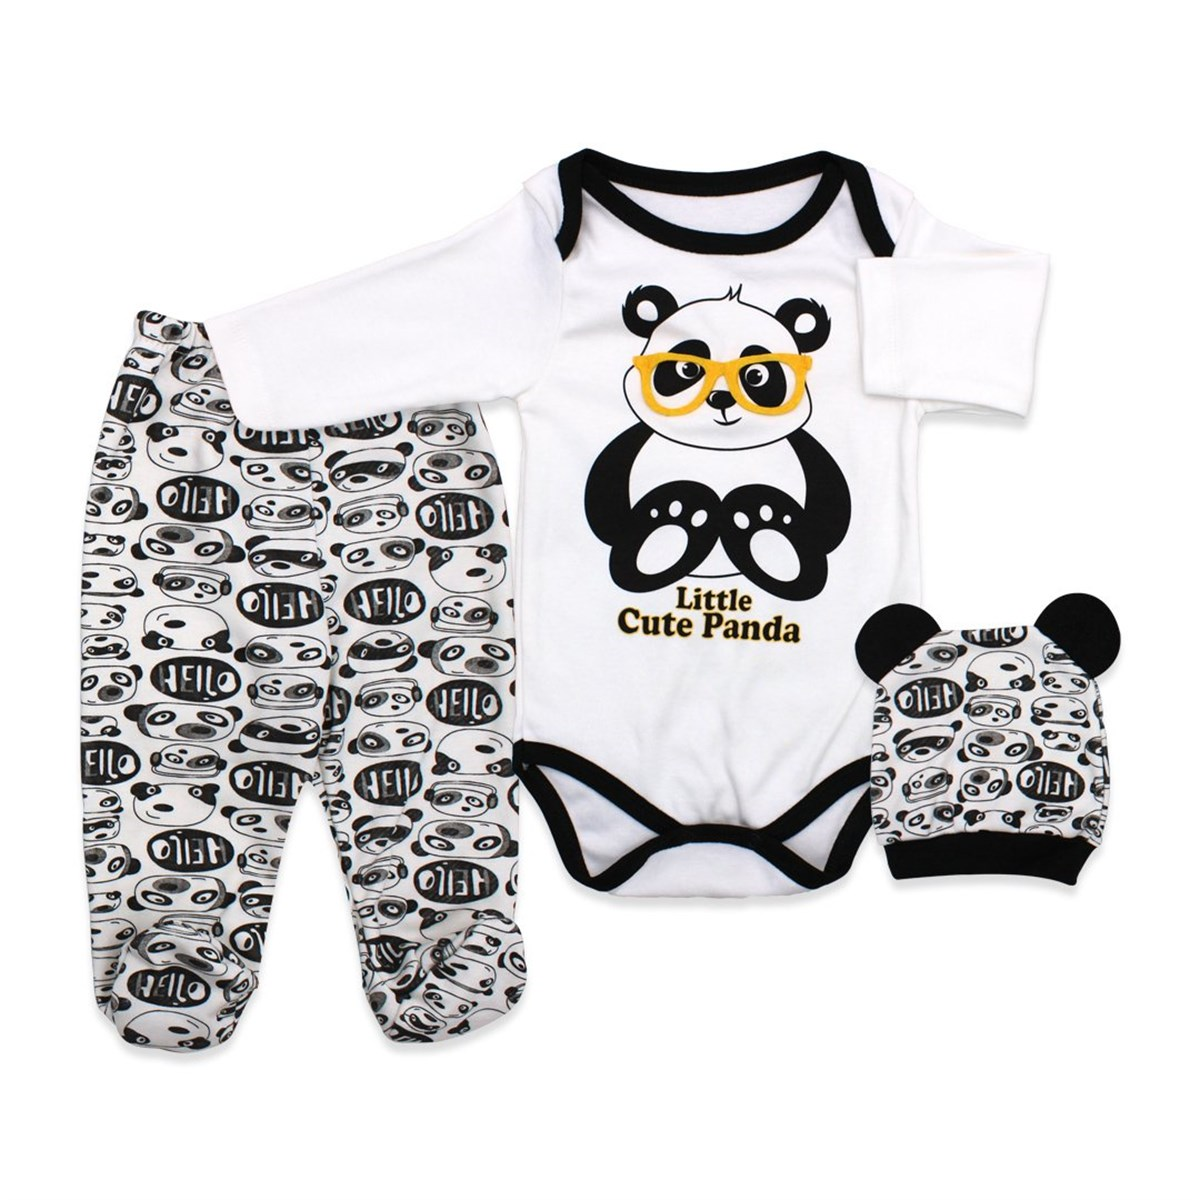 Baby's Printed White Romper Set